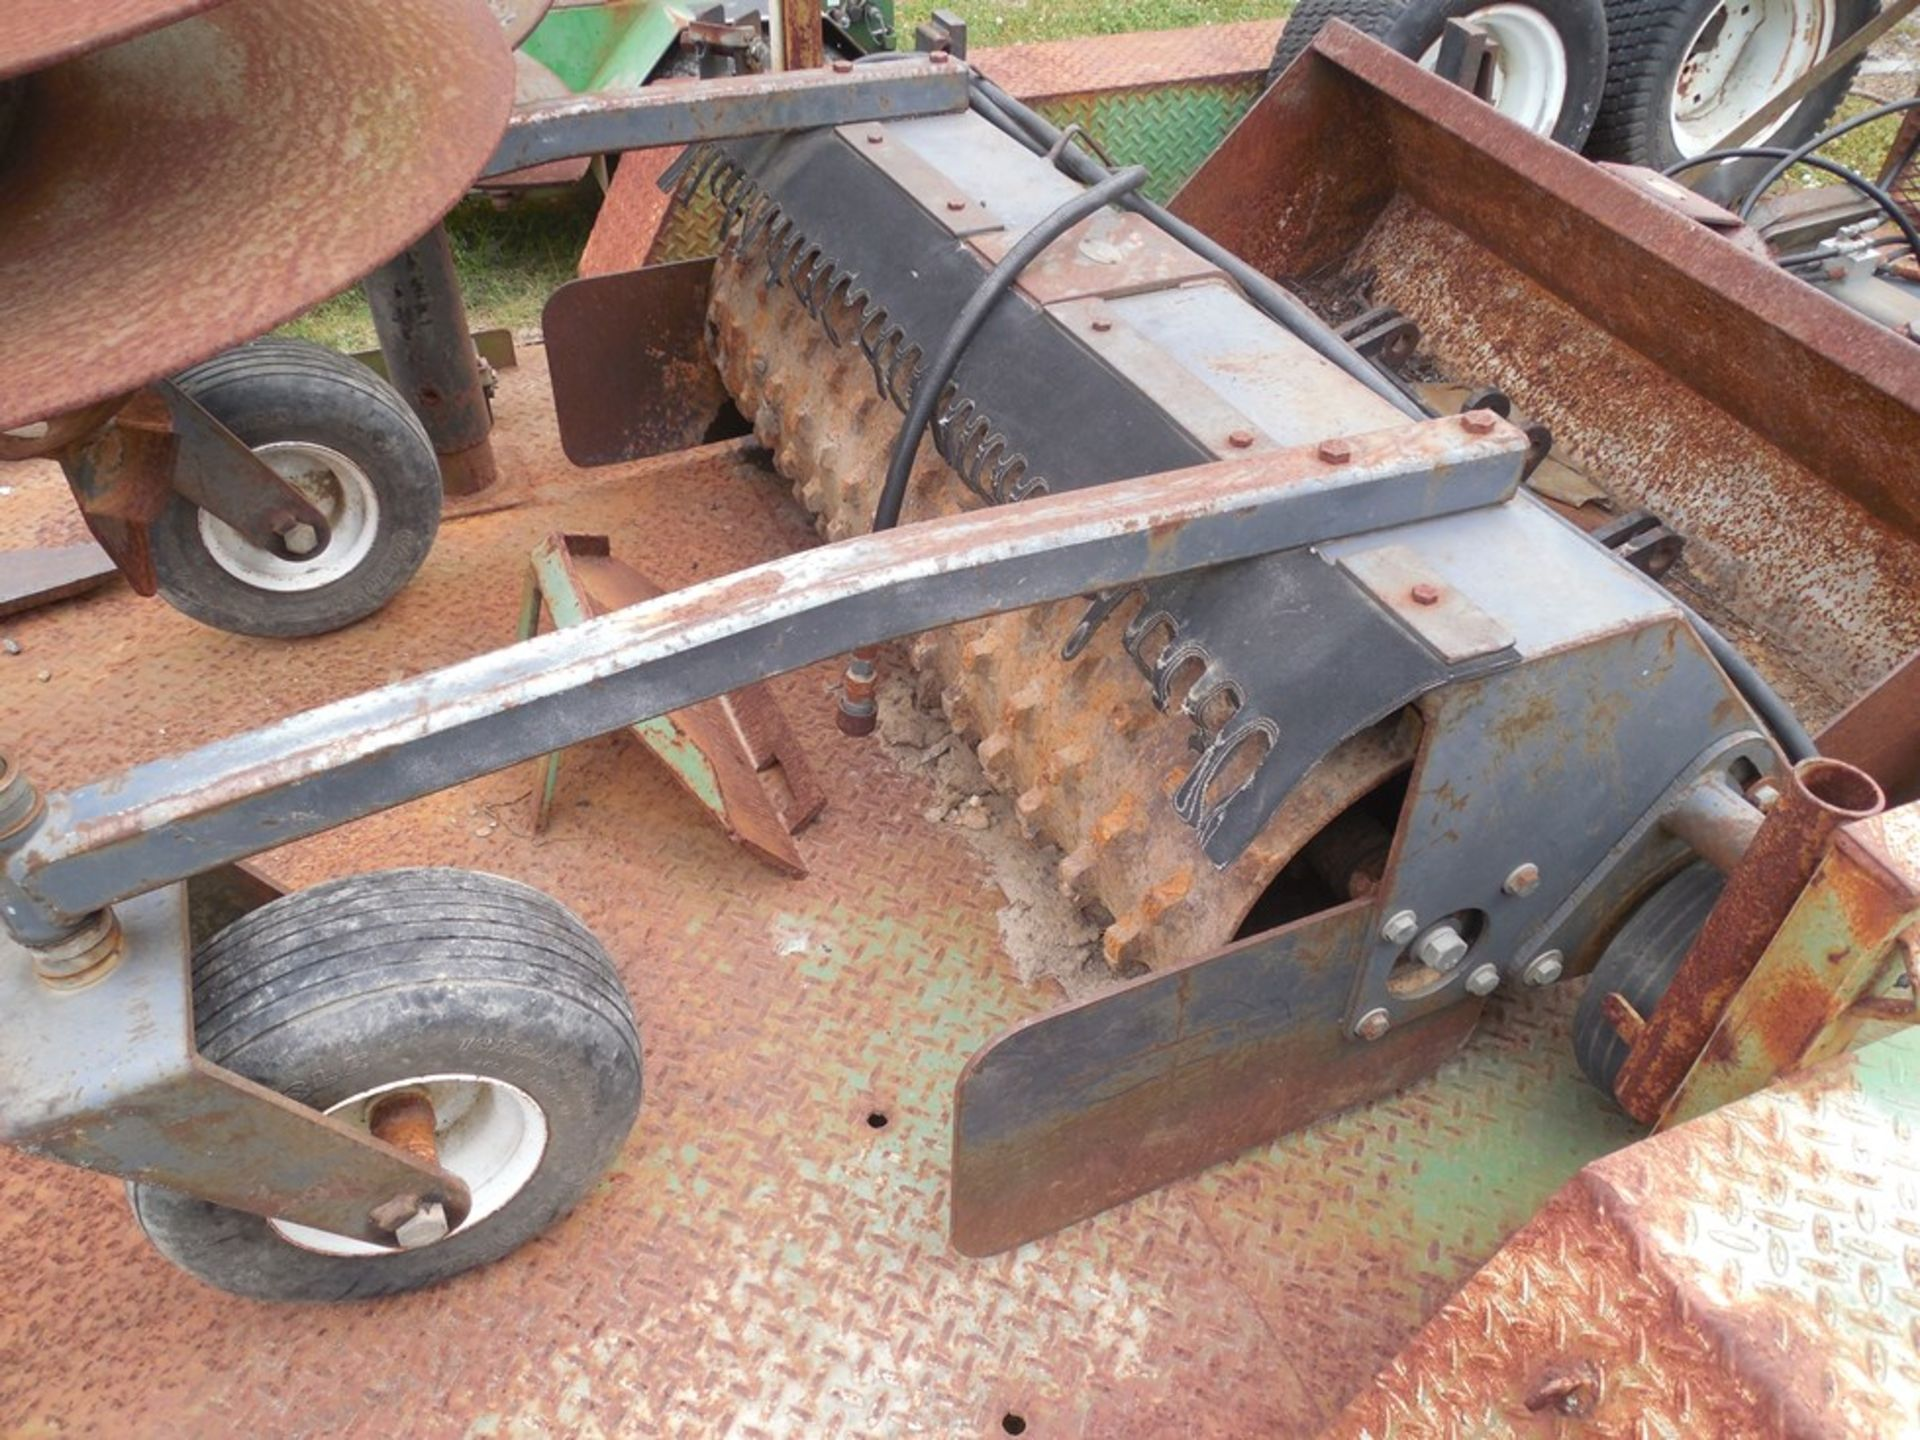 Power Trac PT-2425 Mini Skid Steer ser# 18928 with trailer, power rake, tree spade, front bucket, - Image 13 of 13